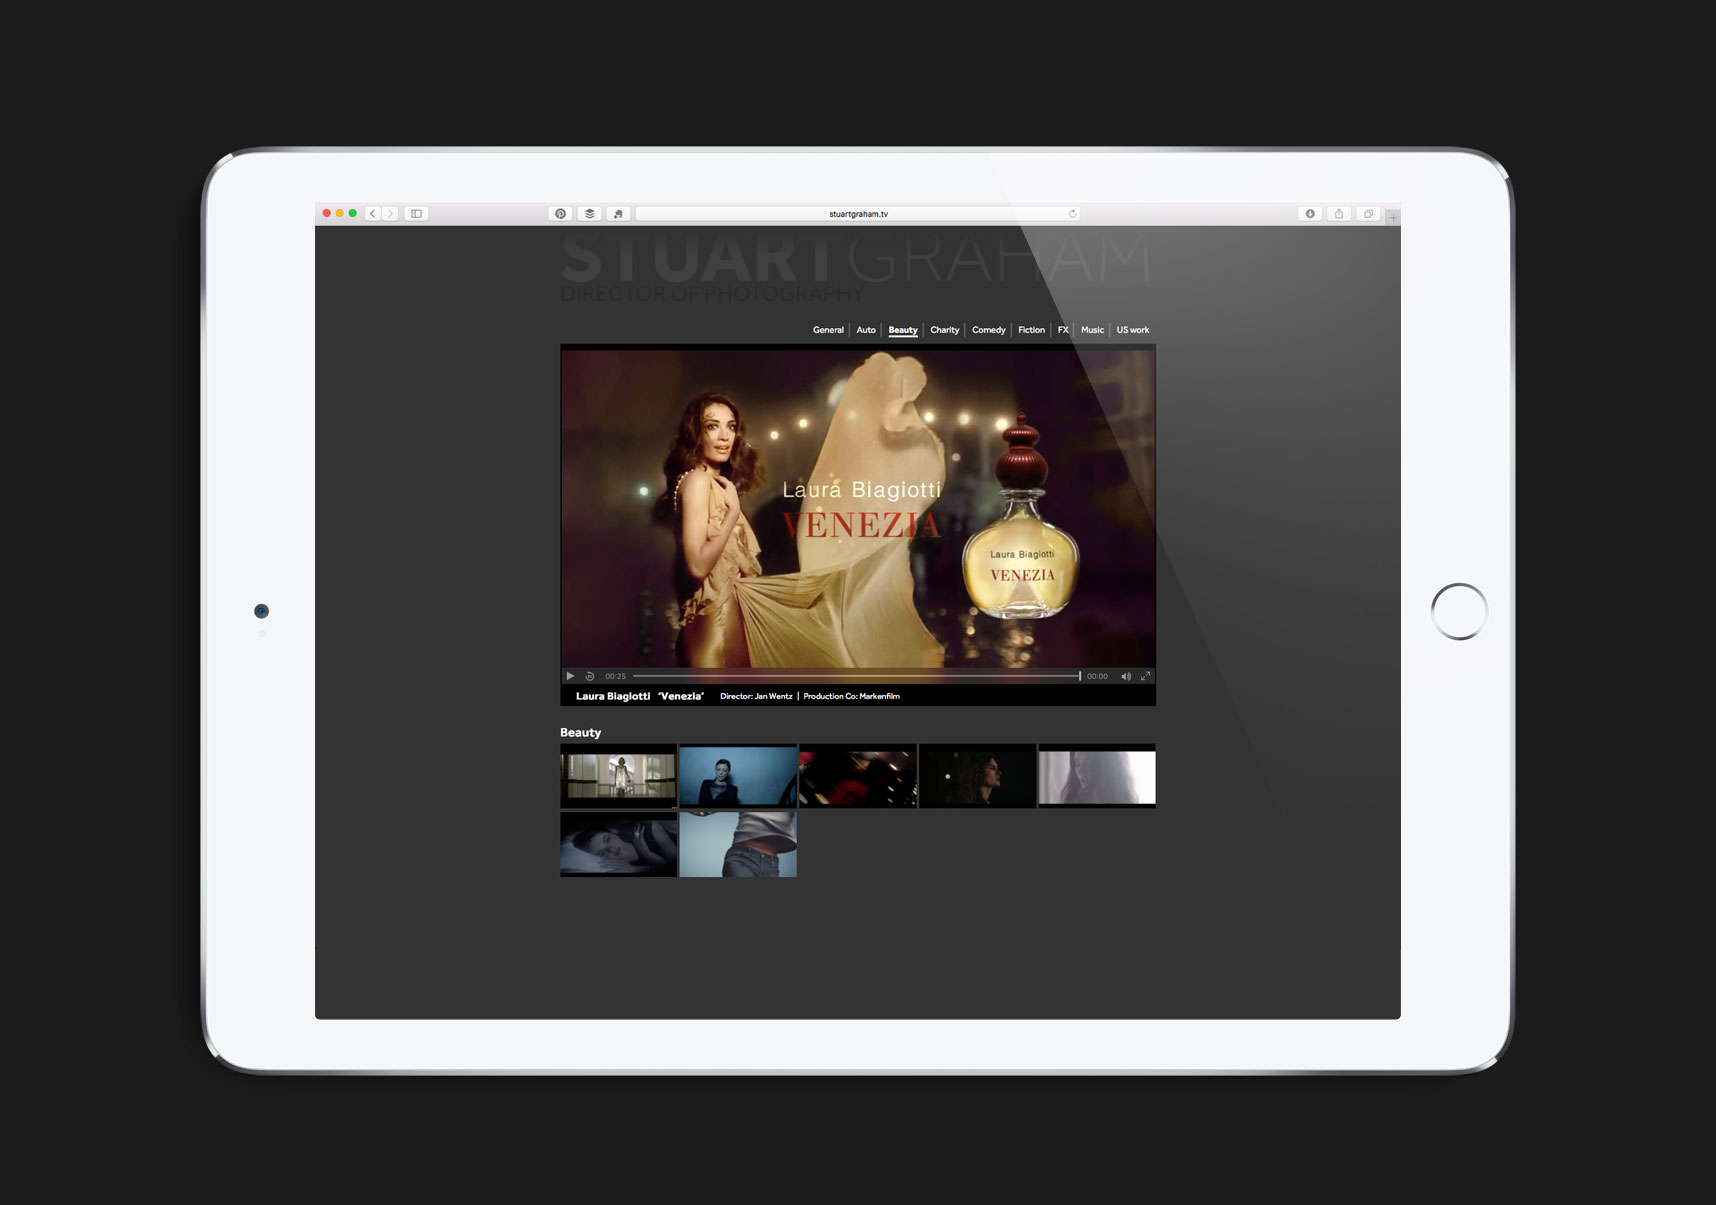 StuartGraham_iPad_03.jpg